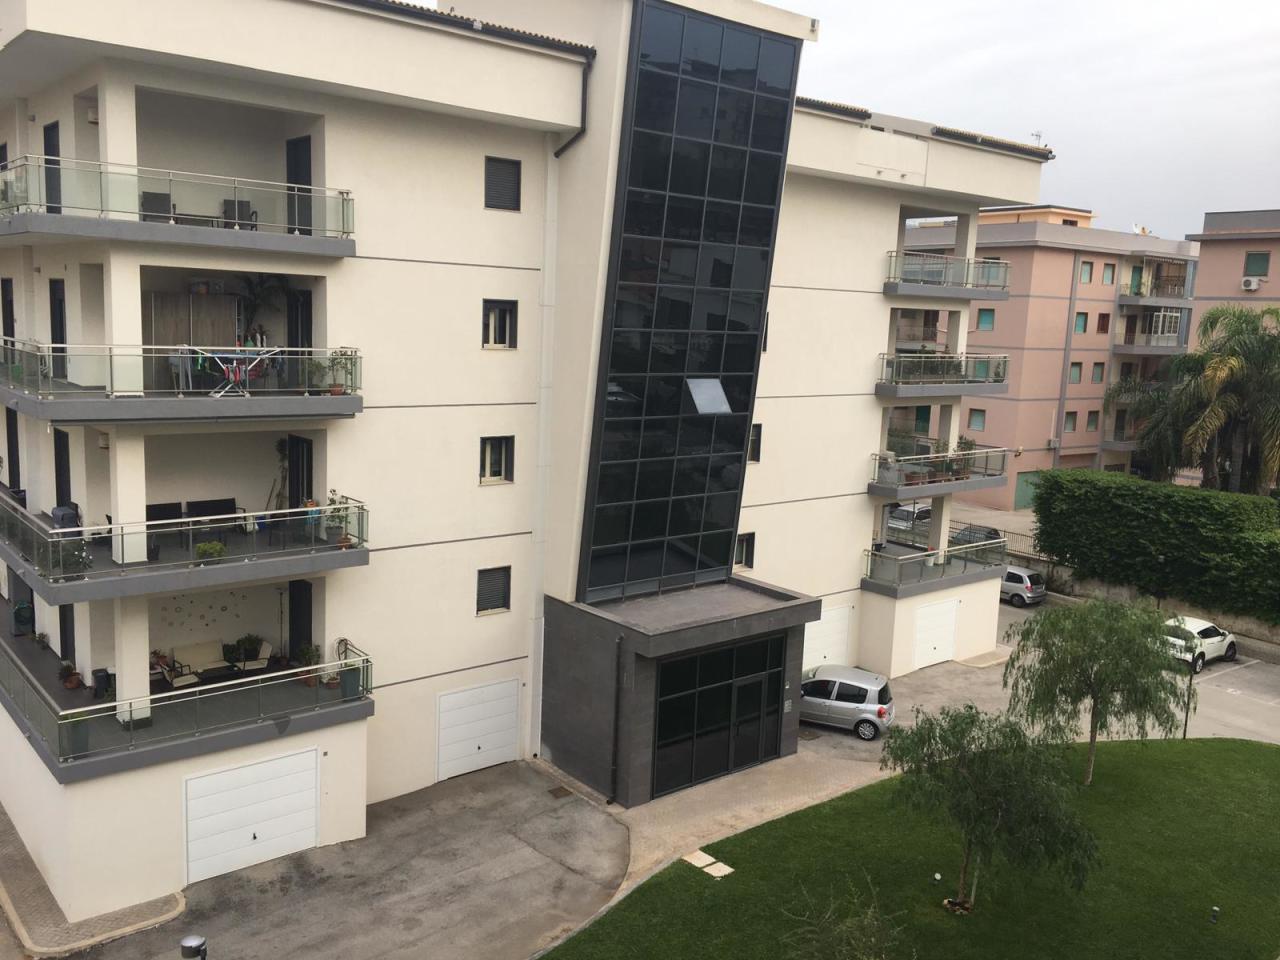 siracusa vendita quart: pizzuta scala greca schiavone-immobiliare